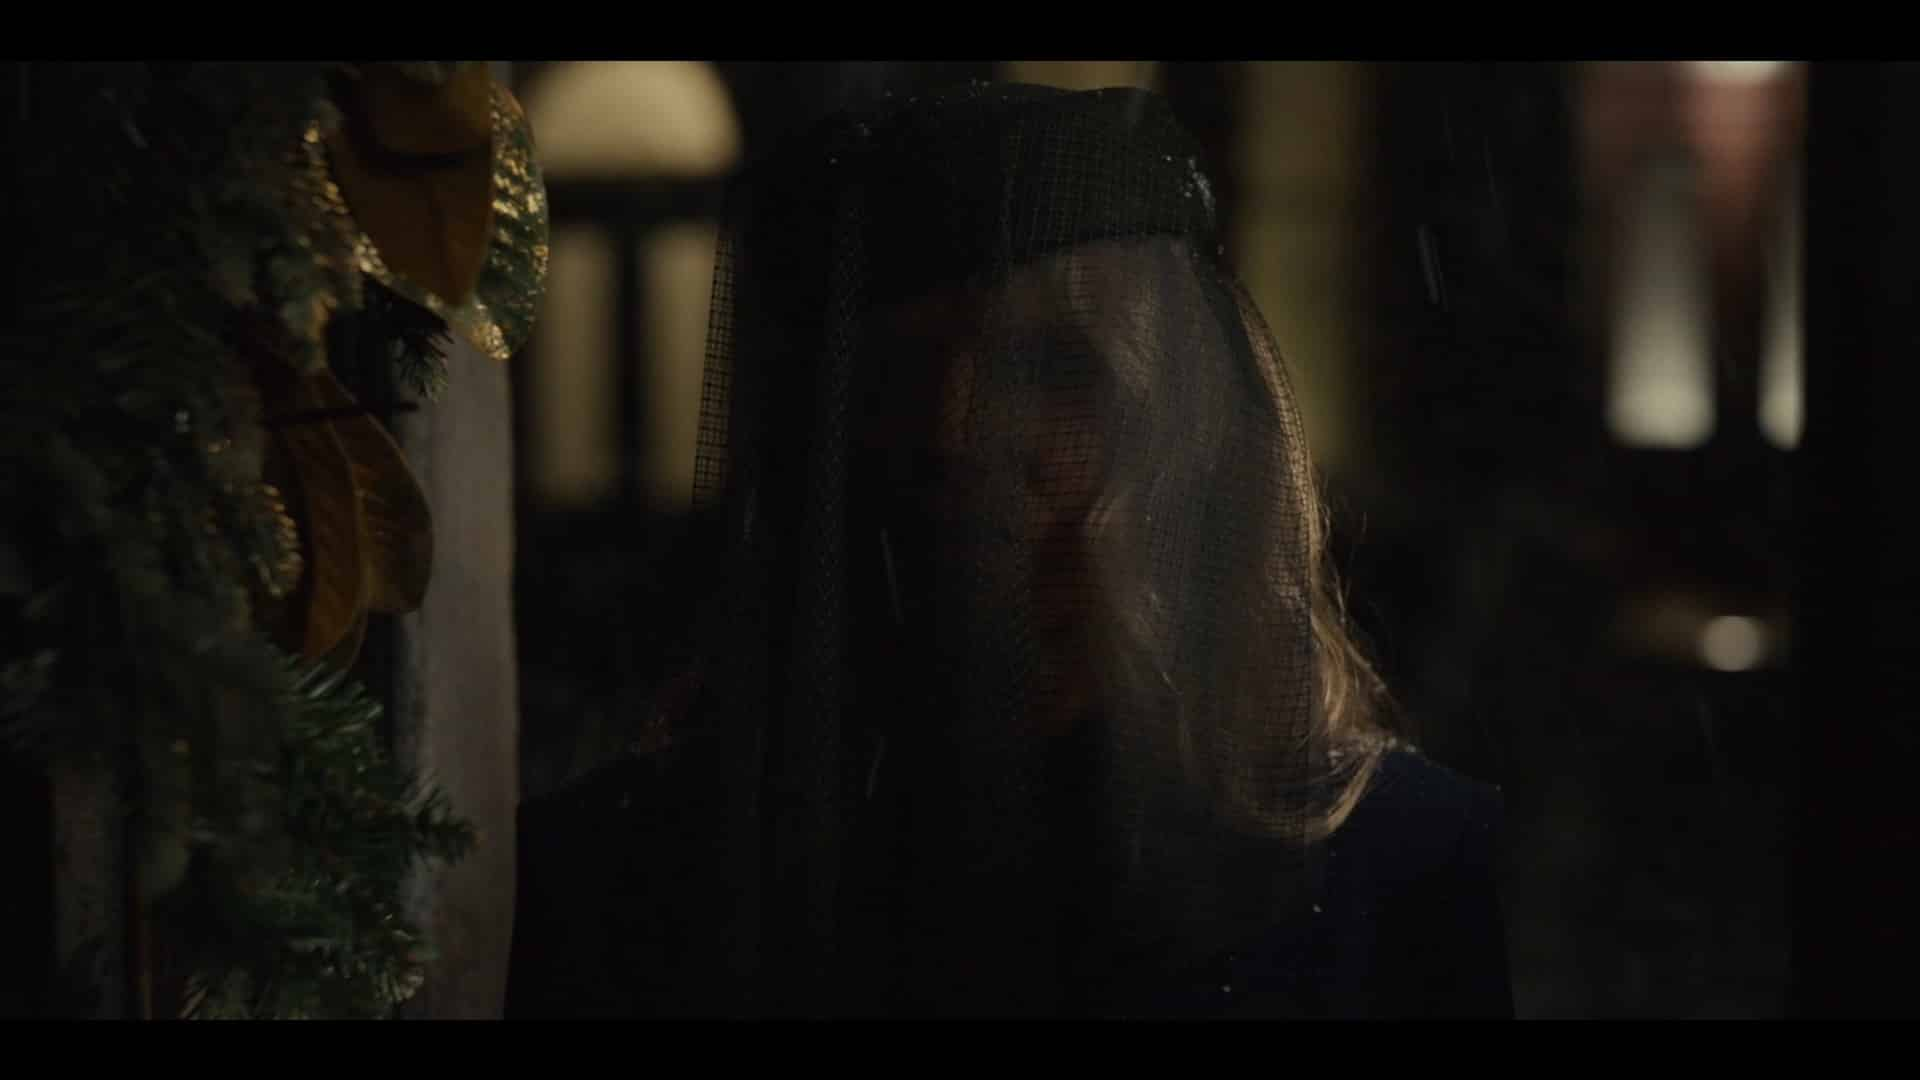 Aunt Josephine (Barbara Sukowa) showing up at Sean's doorstep